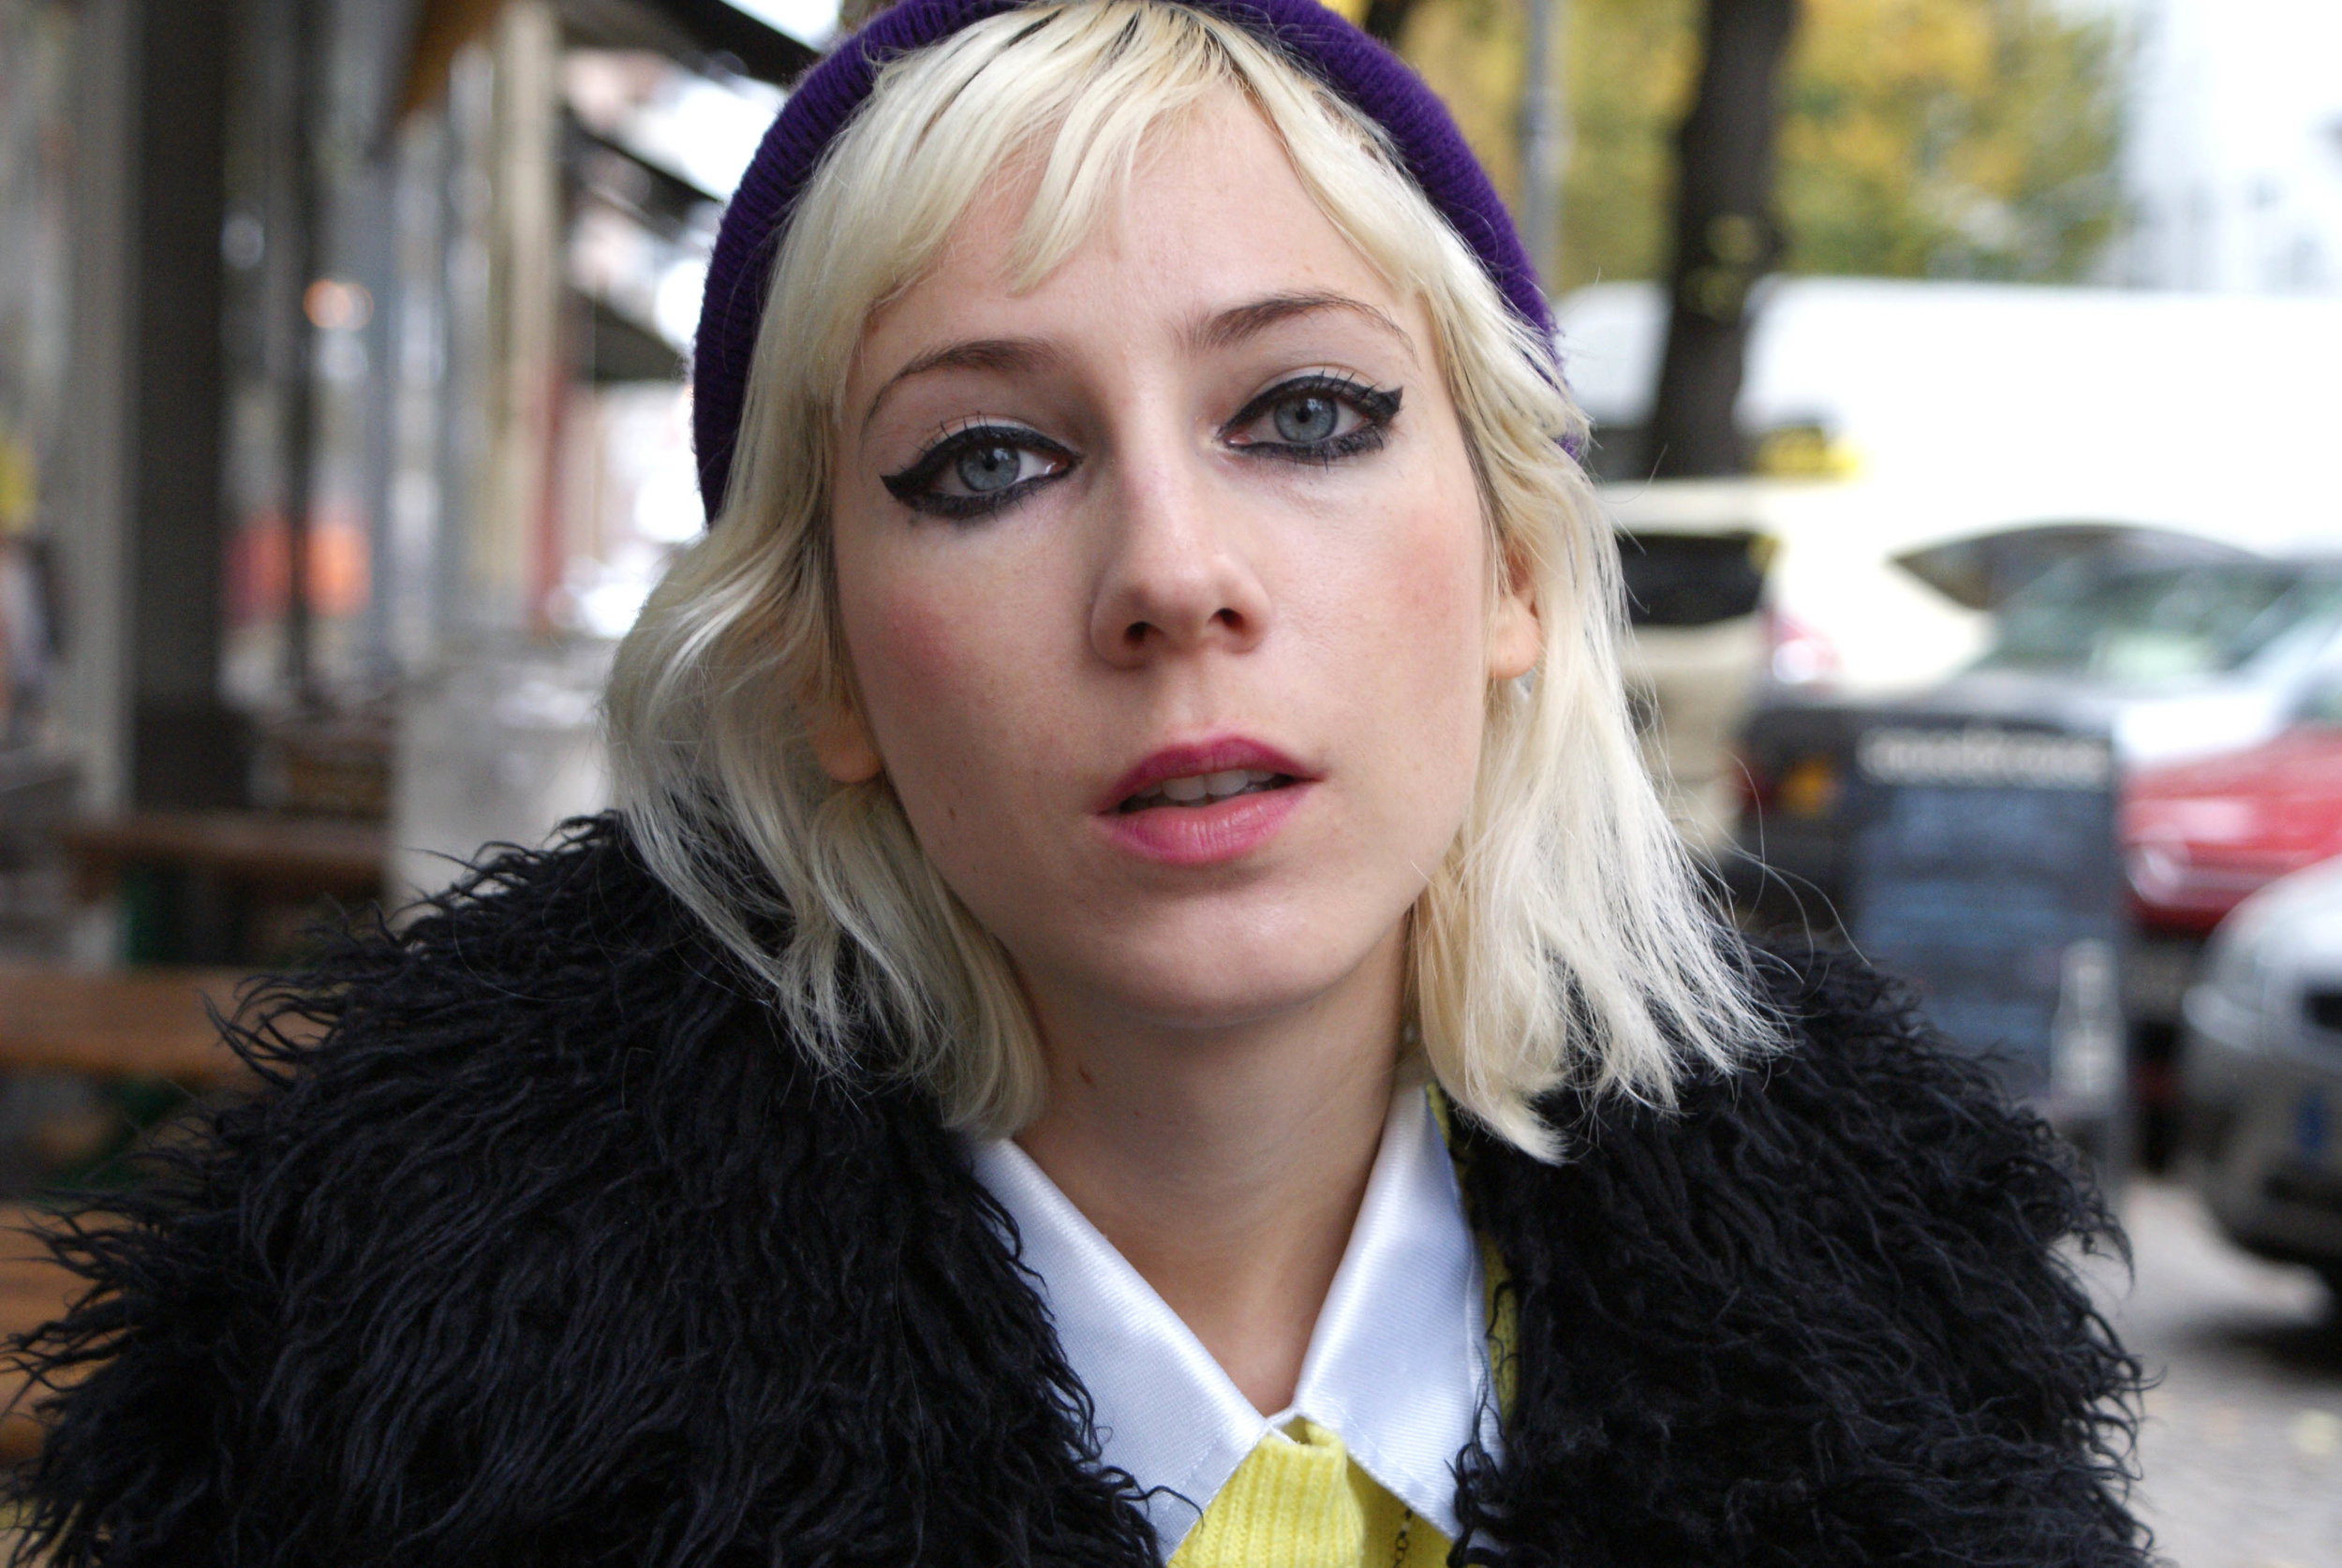 Laetitia Duveau aka Little Voice